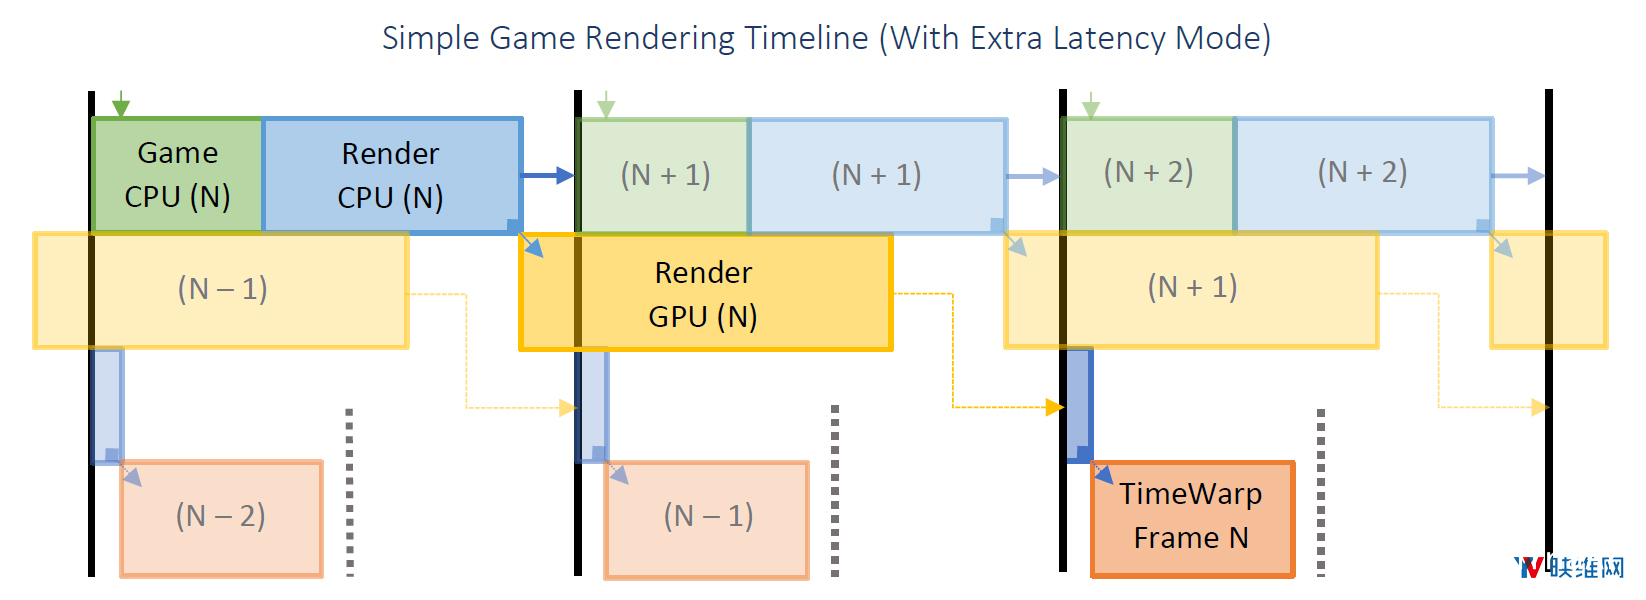 Oculus详述『延迟』问题及对应『帧渲染』解决方案 资源教程 第5张